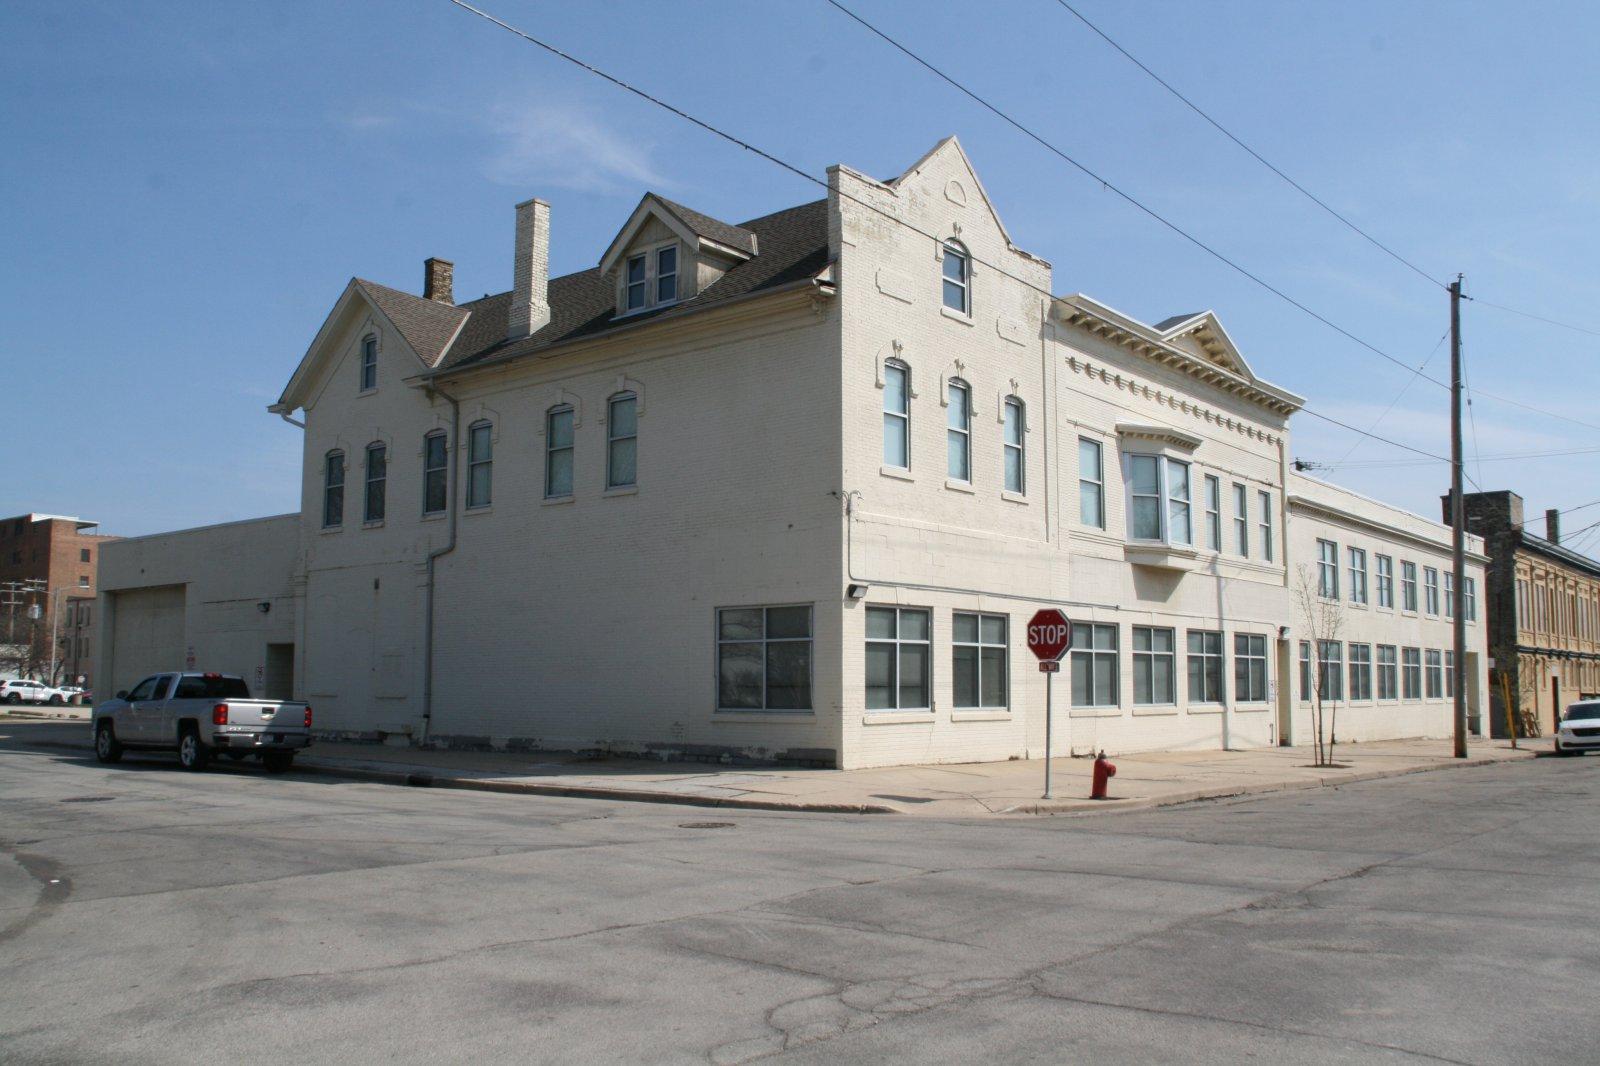 334 W. Brown St.